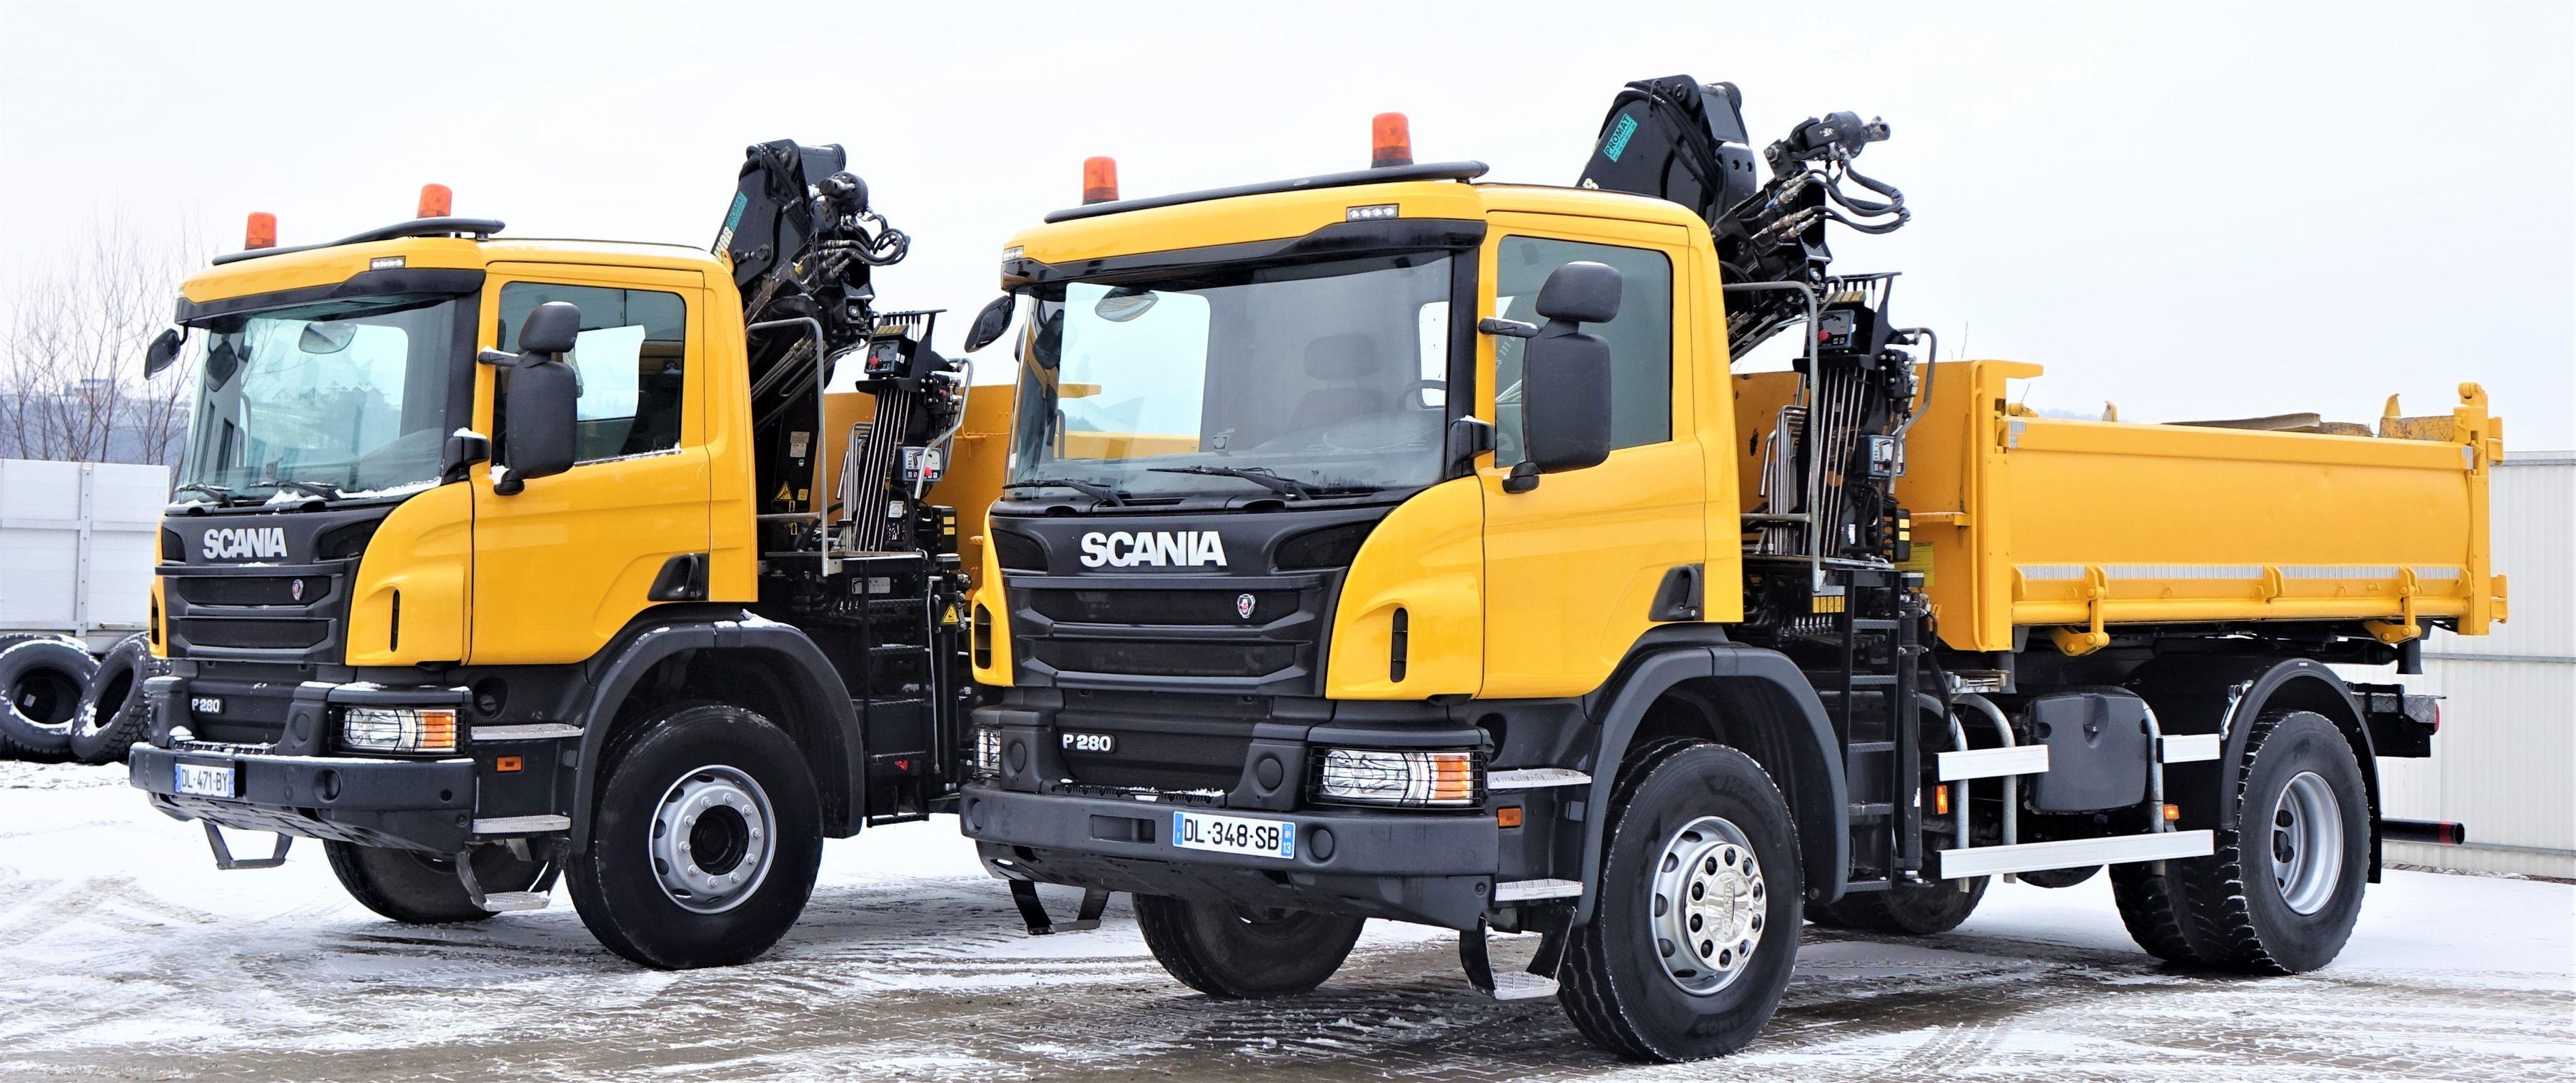 2015-scania-p280-320995-equipment-cover-image